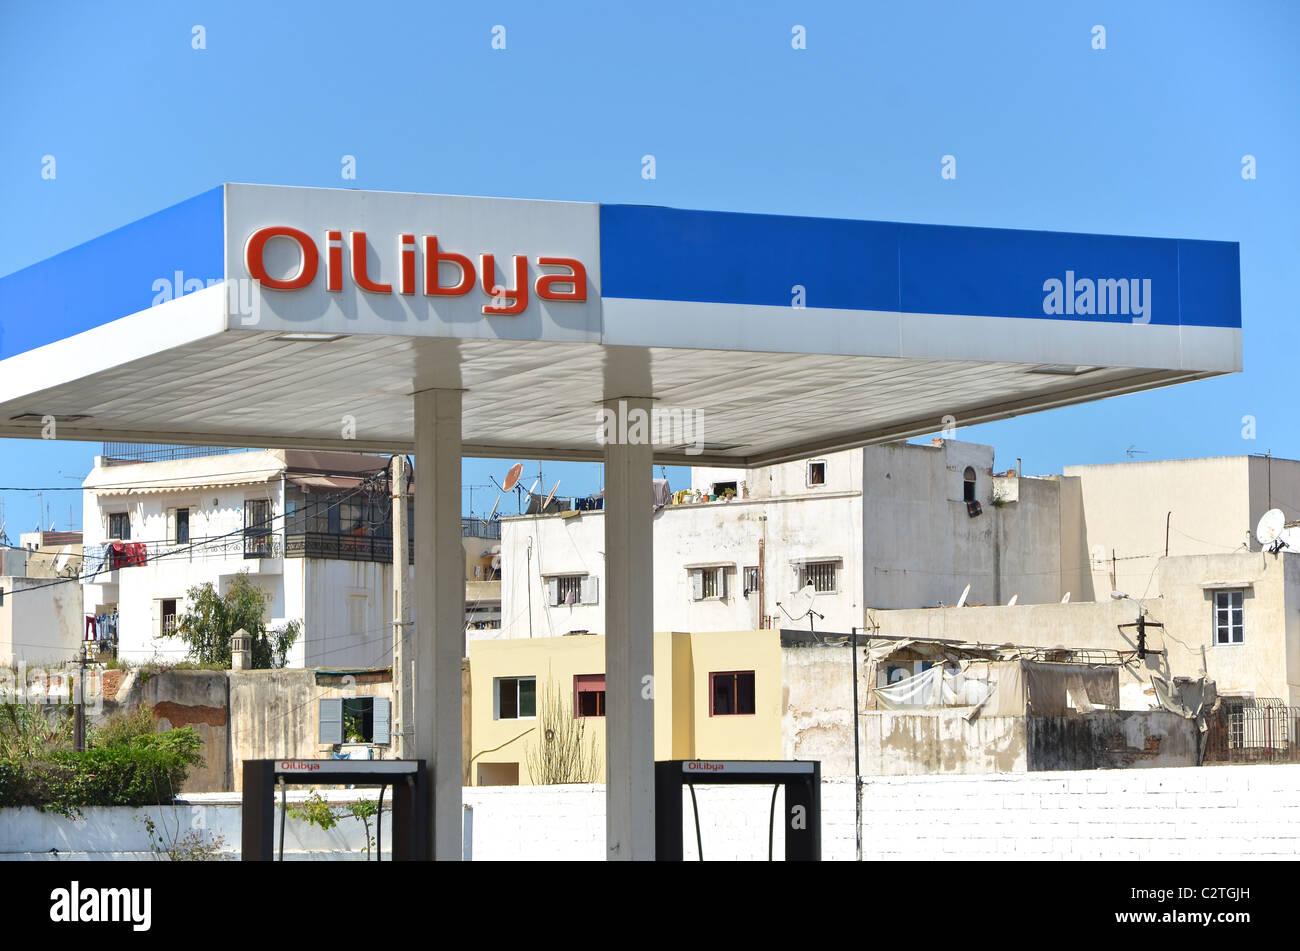 Libya Oil Stock Photos & Libya Oil Stock Images - Alamy